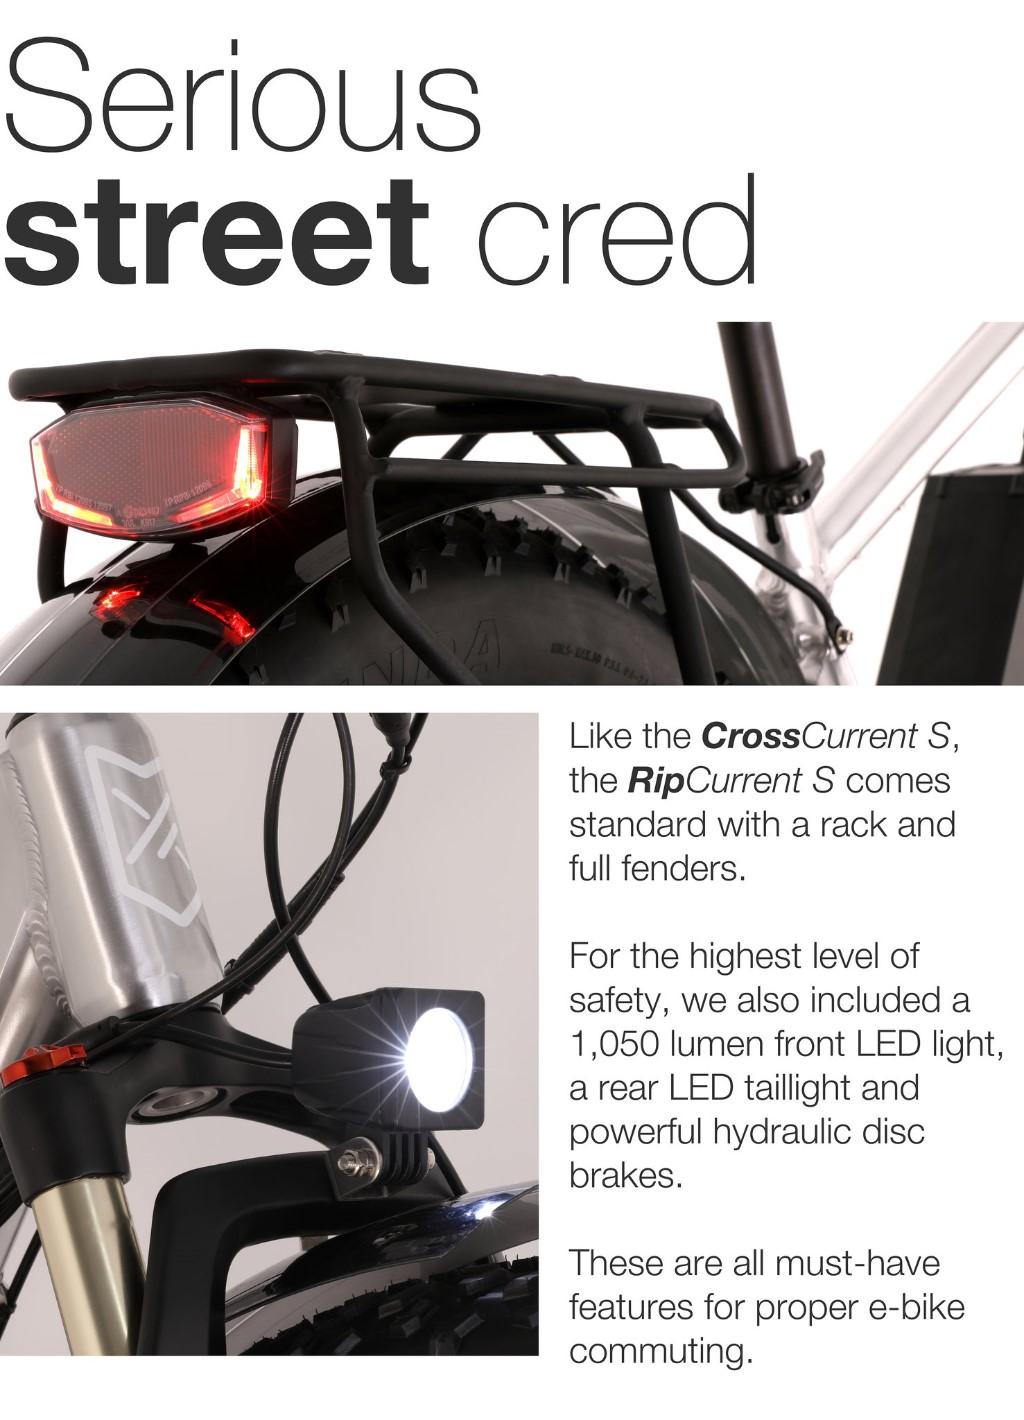 serious-street-cred-2-1024.jpg